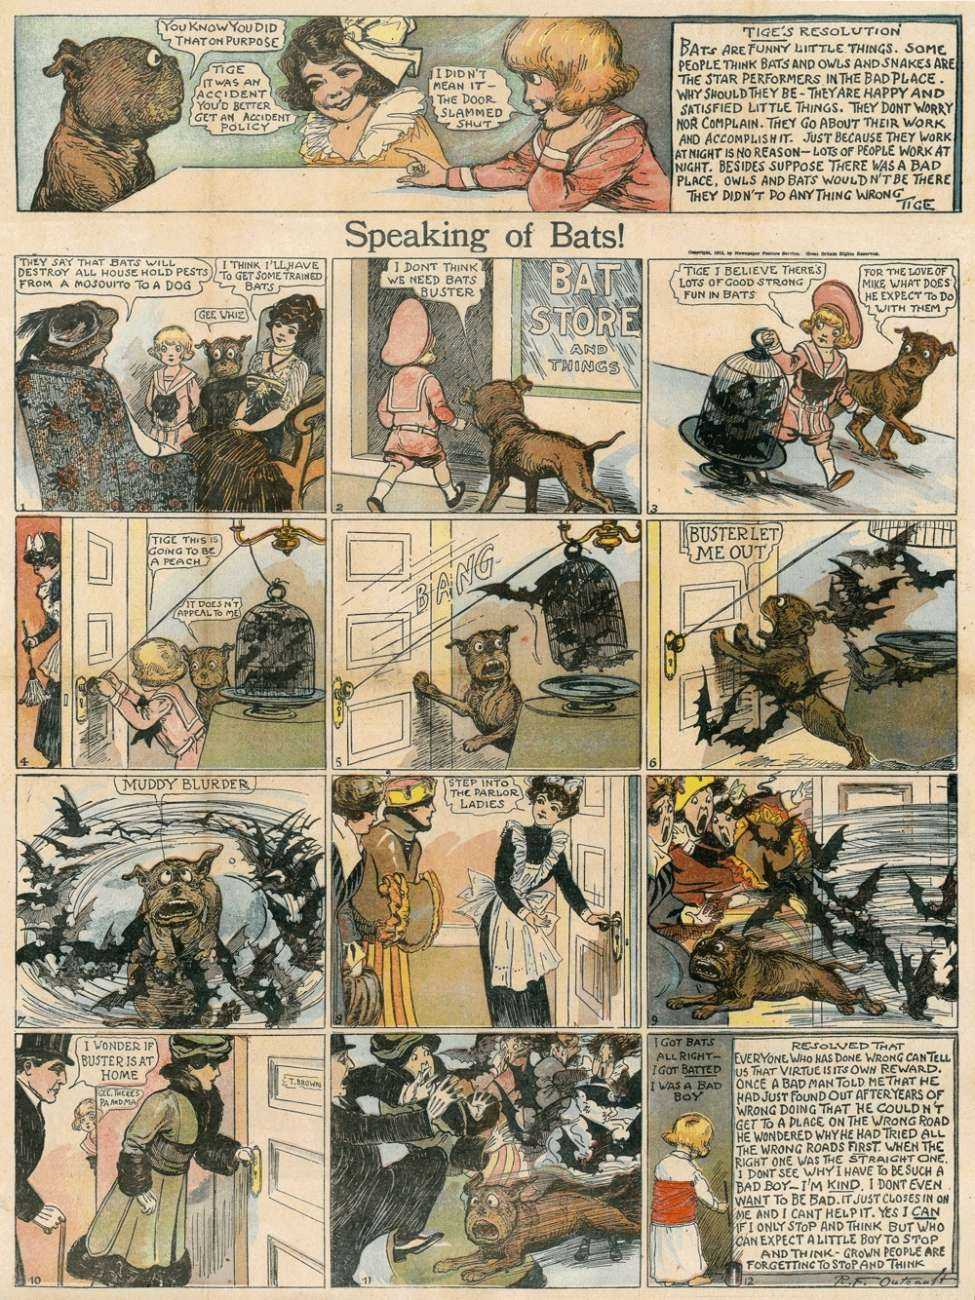 comic-en-diarios-speaking-of-bats-Richard-Felton-Outcault